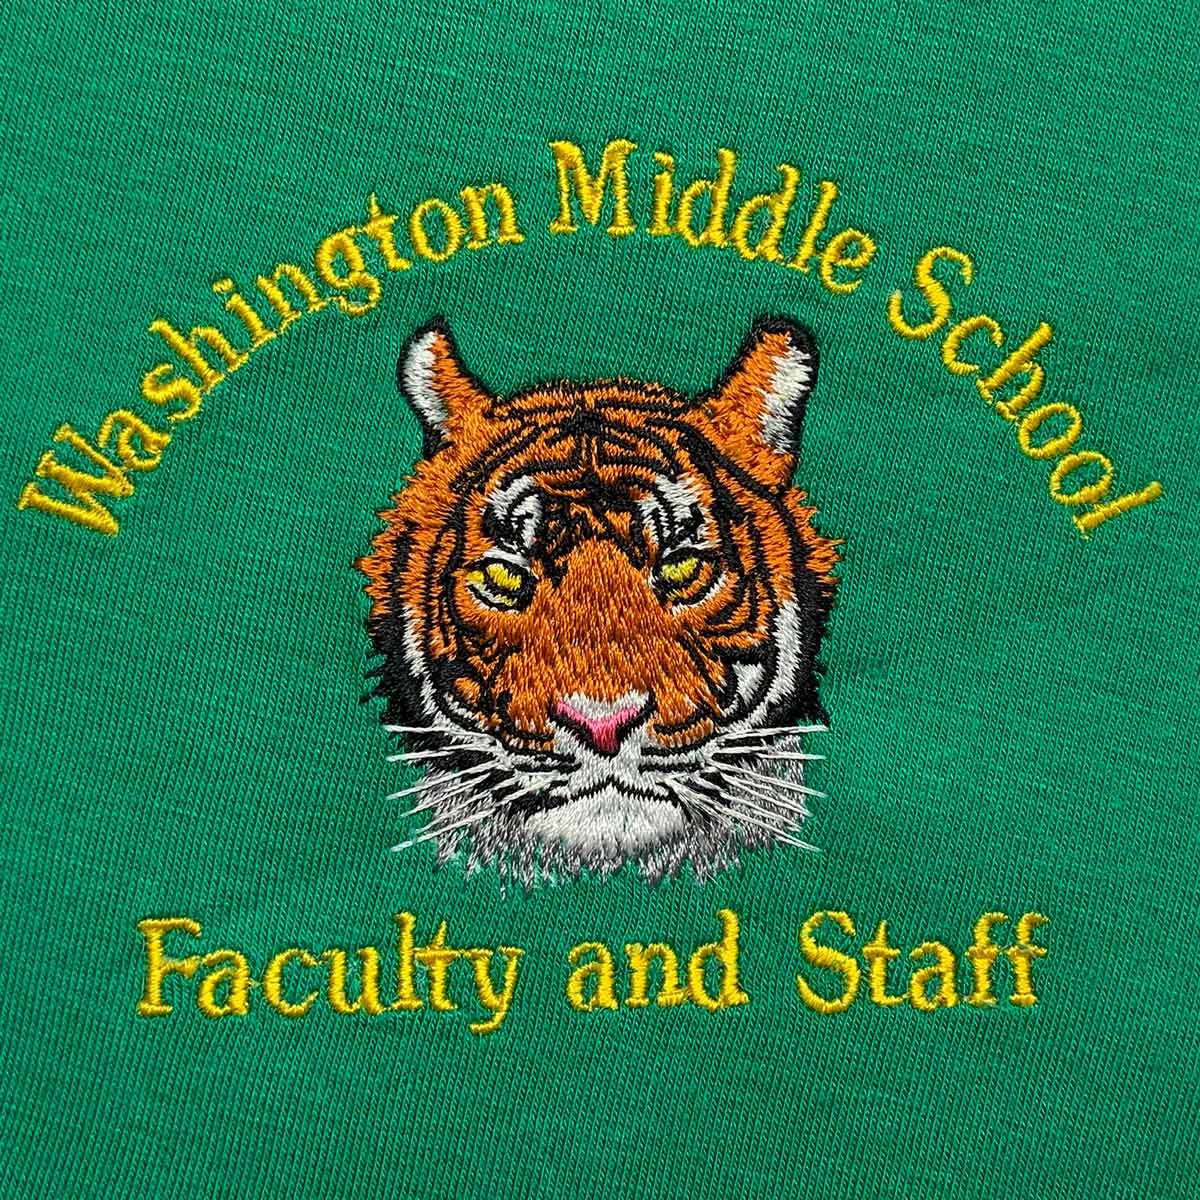 KYC_WASHINGTON-MIDDLE-SCHOOL-FACULTY-AND-STAFF_web.jpg